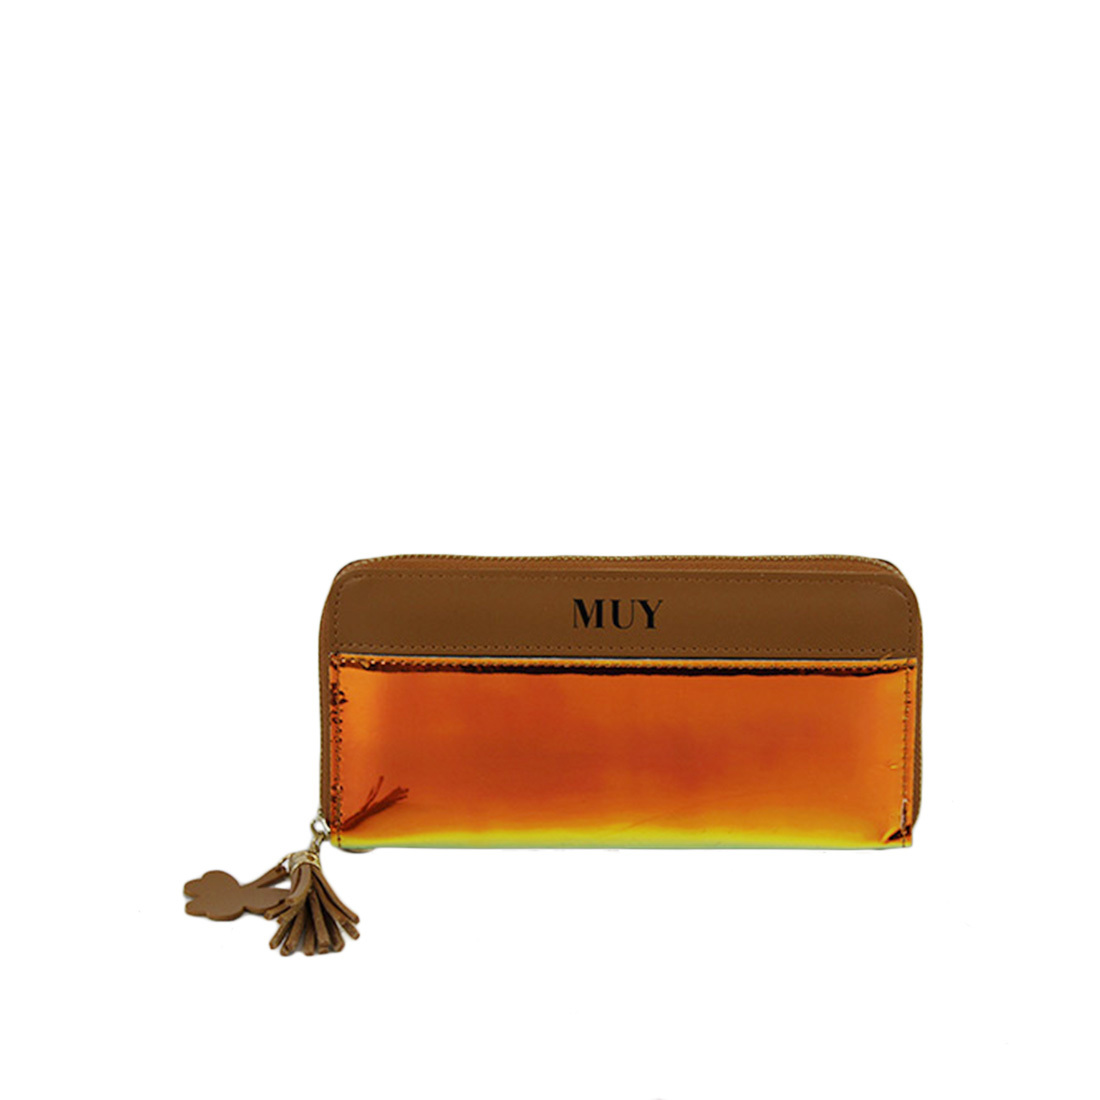 Shiny long zipper wallet